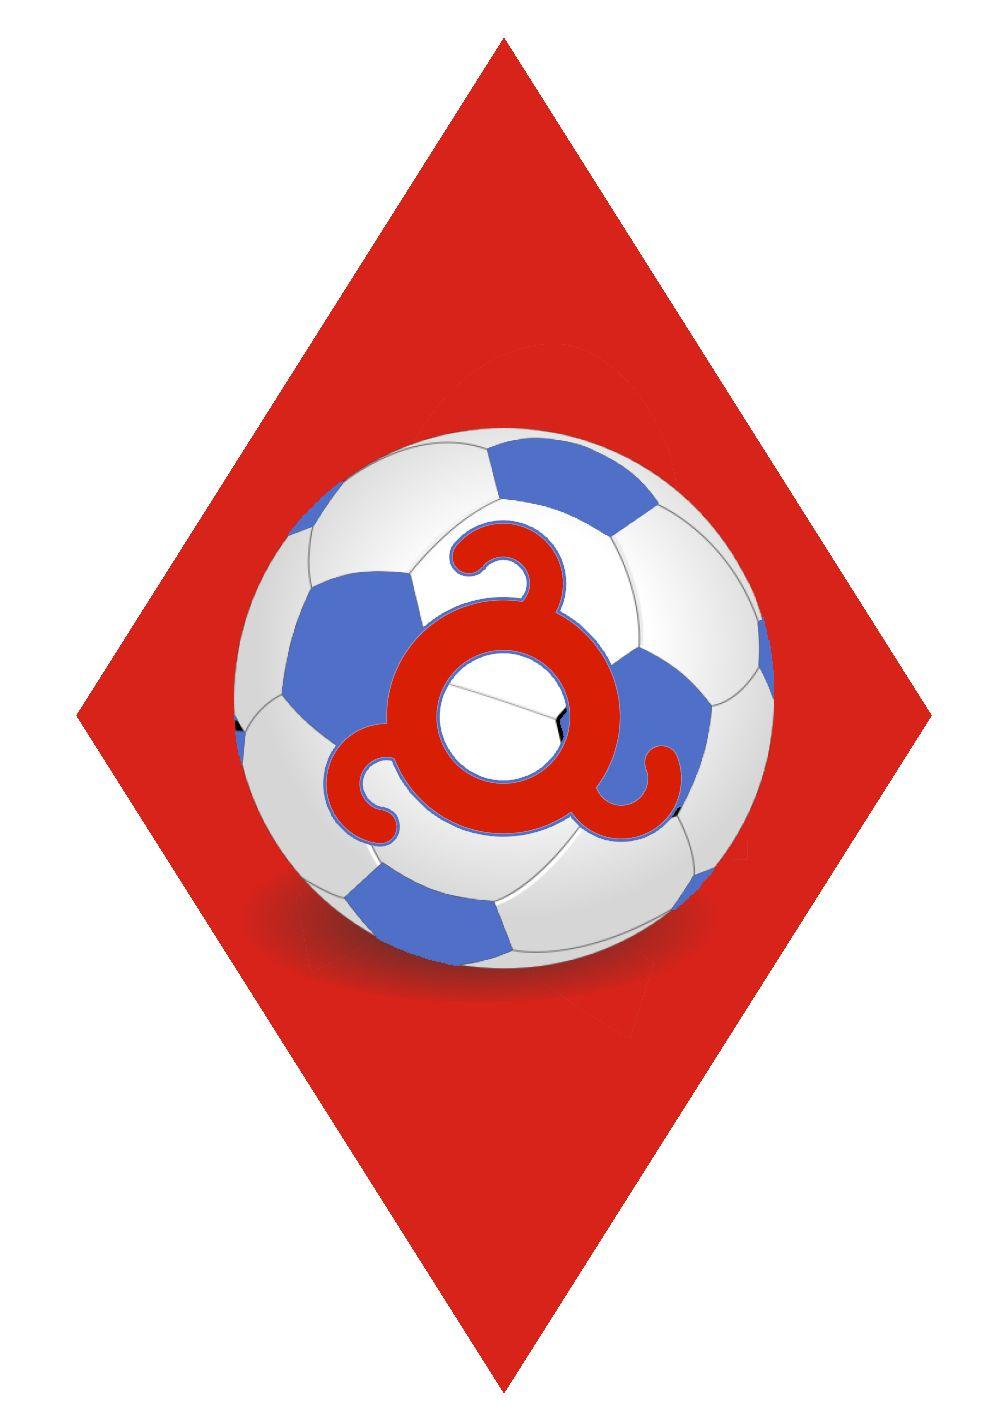 Логотип для Футбольного клуба  - дизайнер ilya_kovalyov